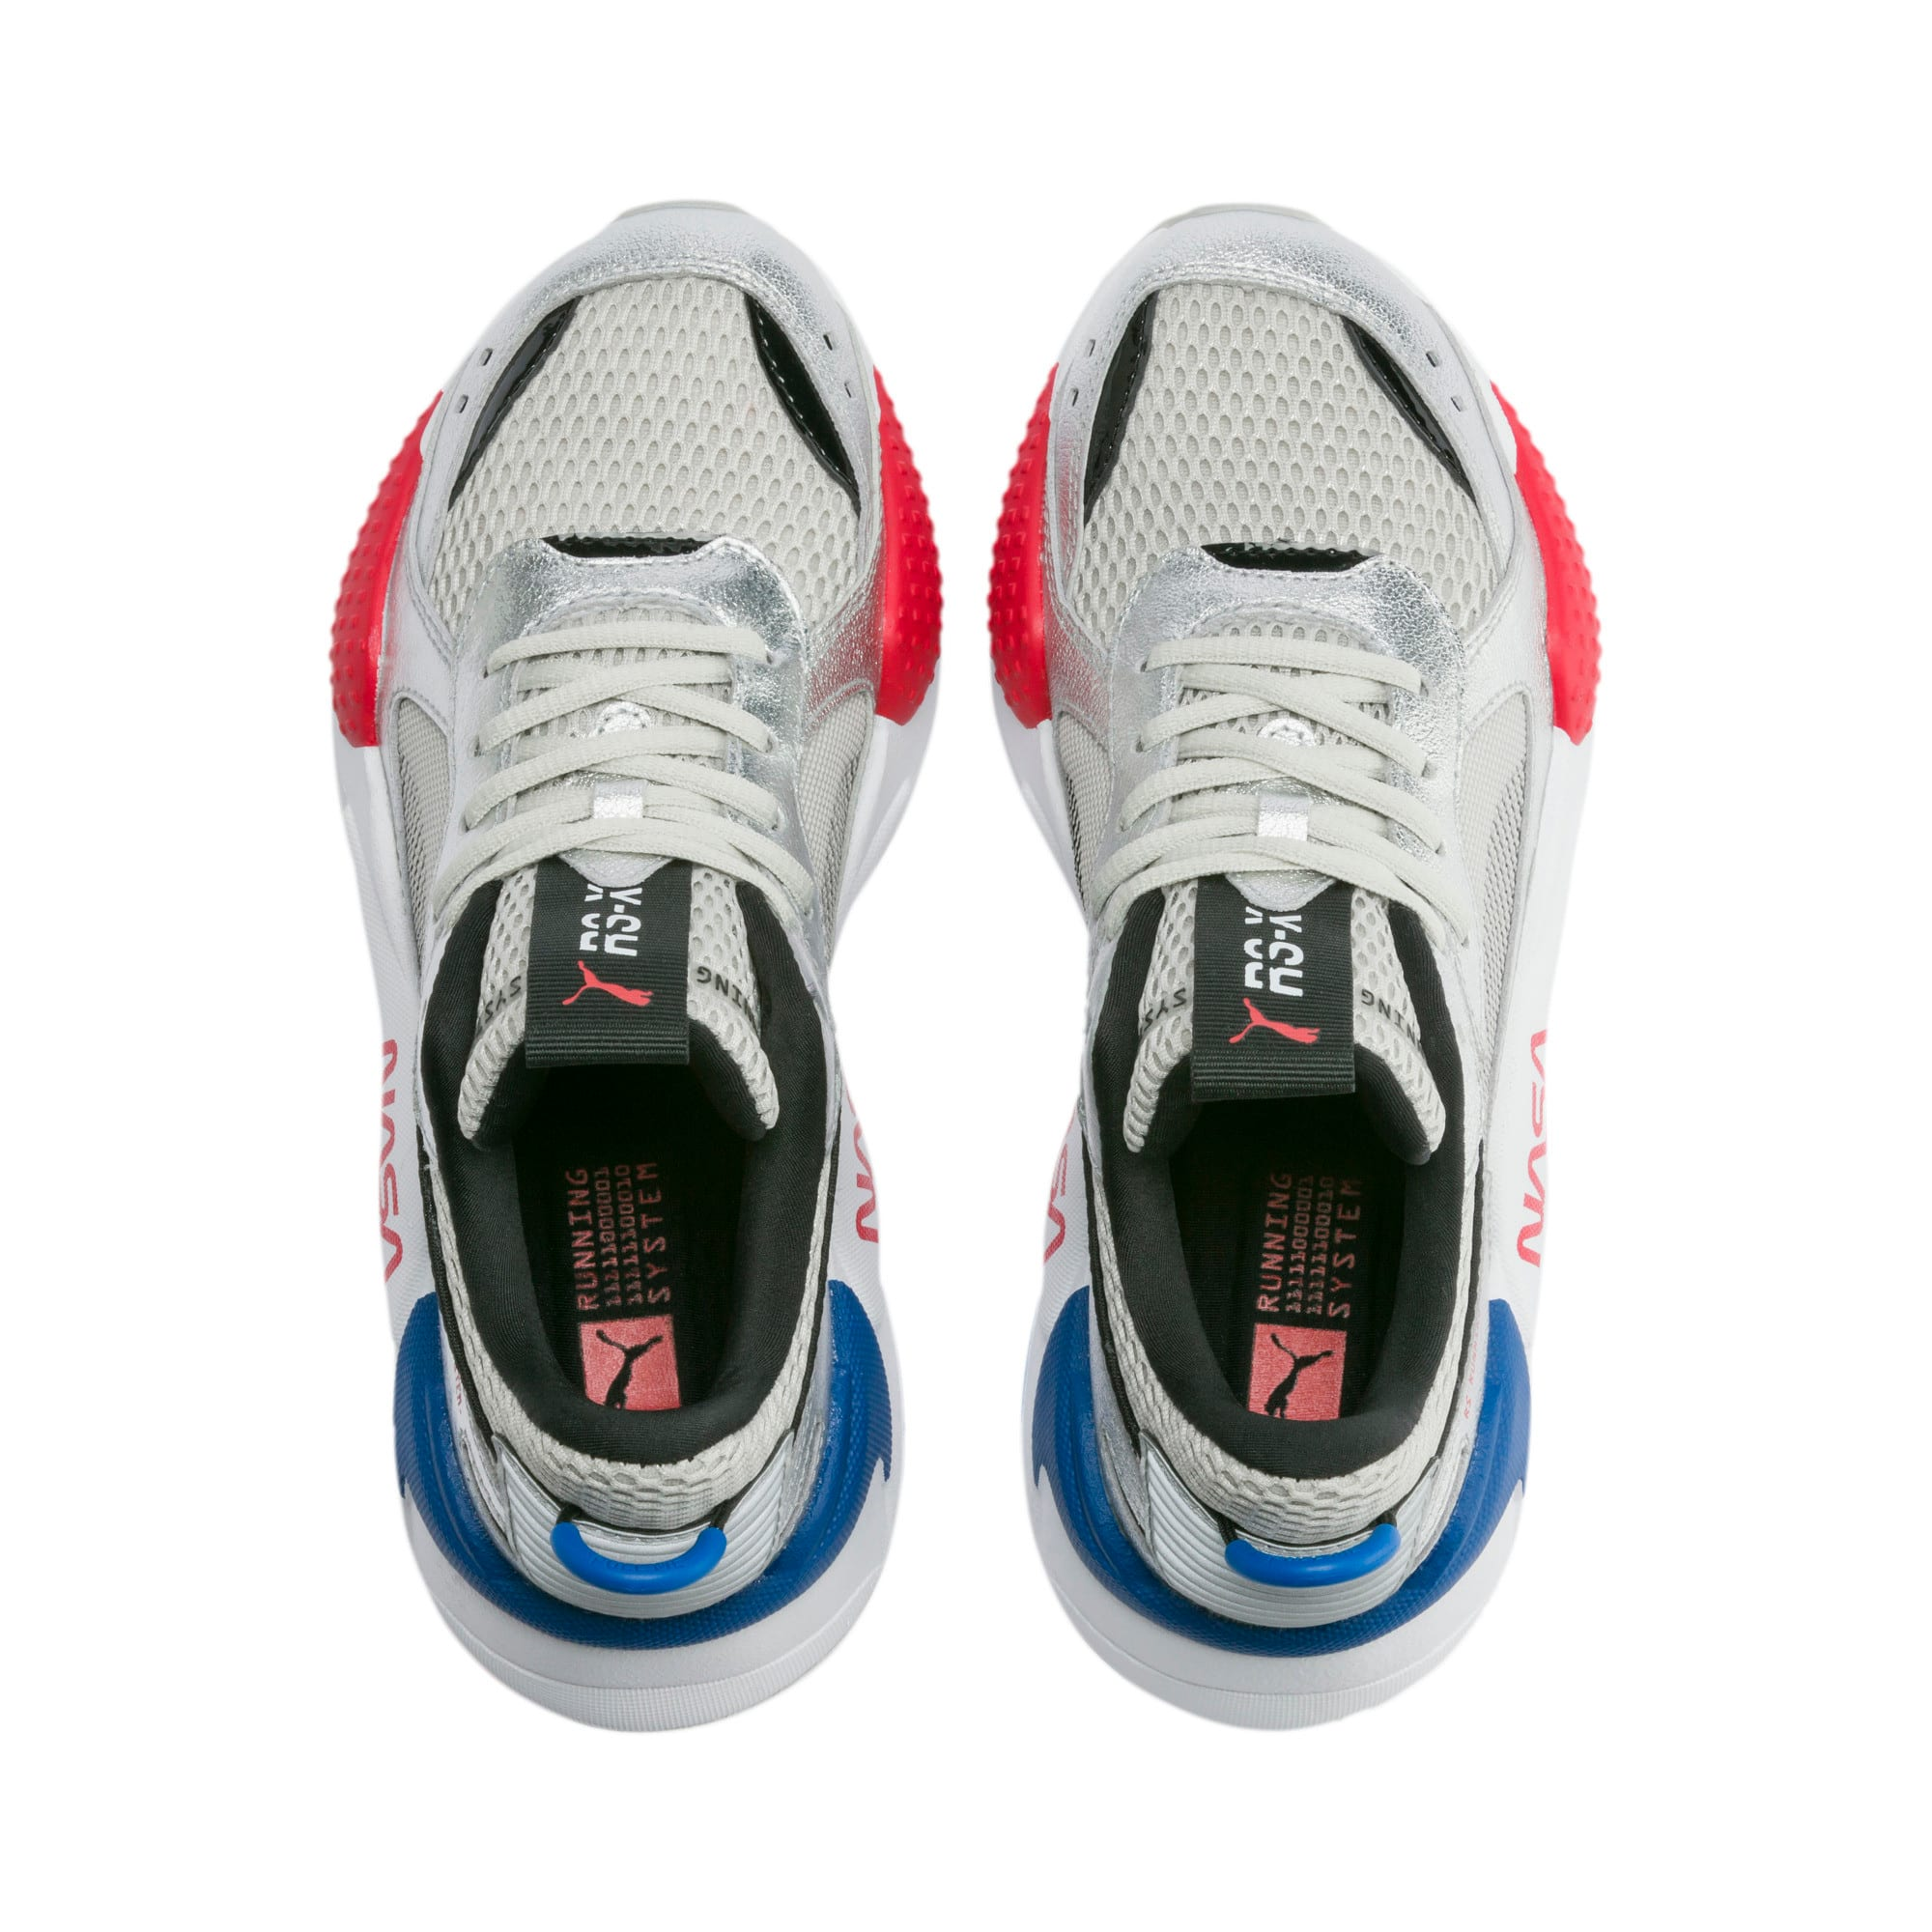 Thumbnail 6 of RS-X Space Agency Sneakers JR, Puma Silver-Gray Violet, medium